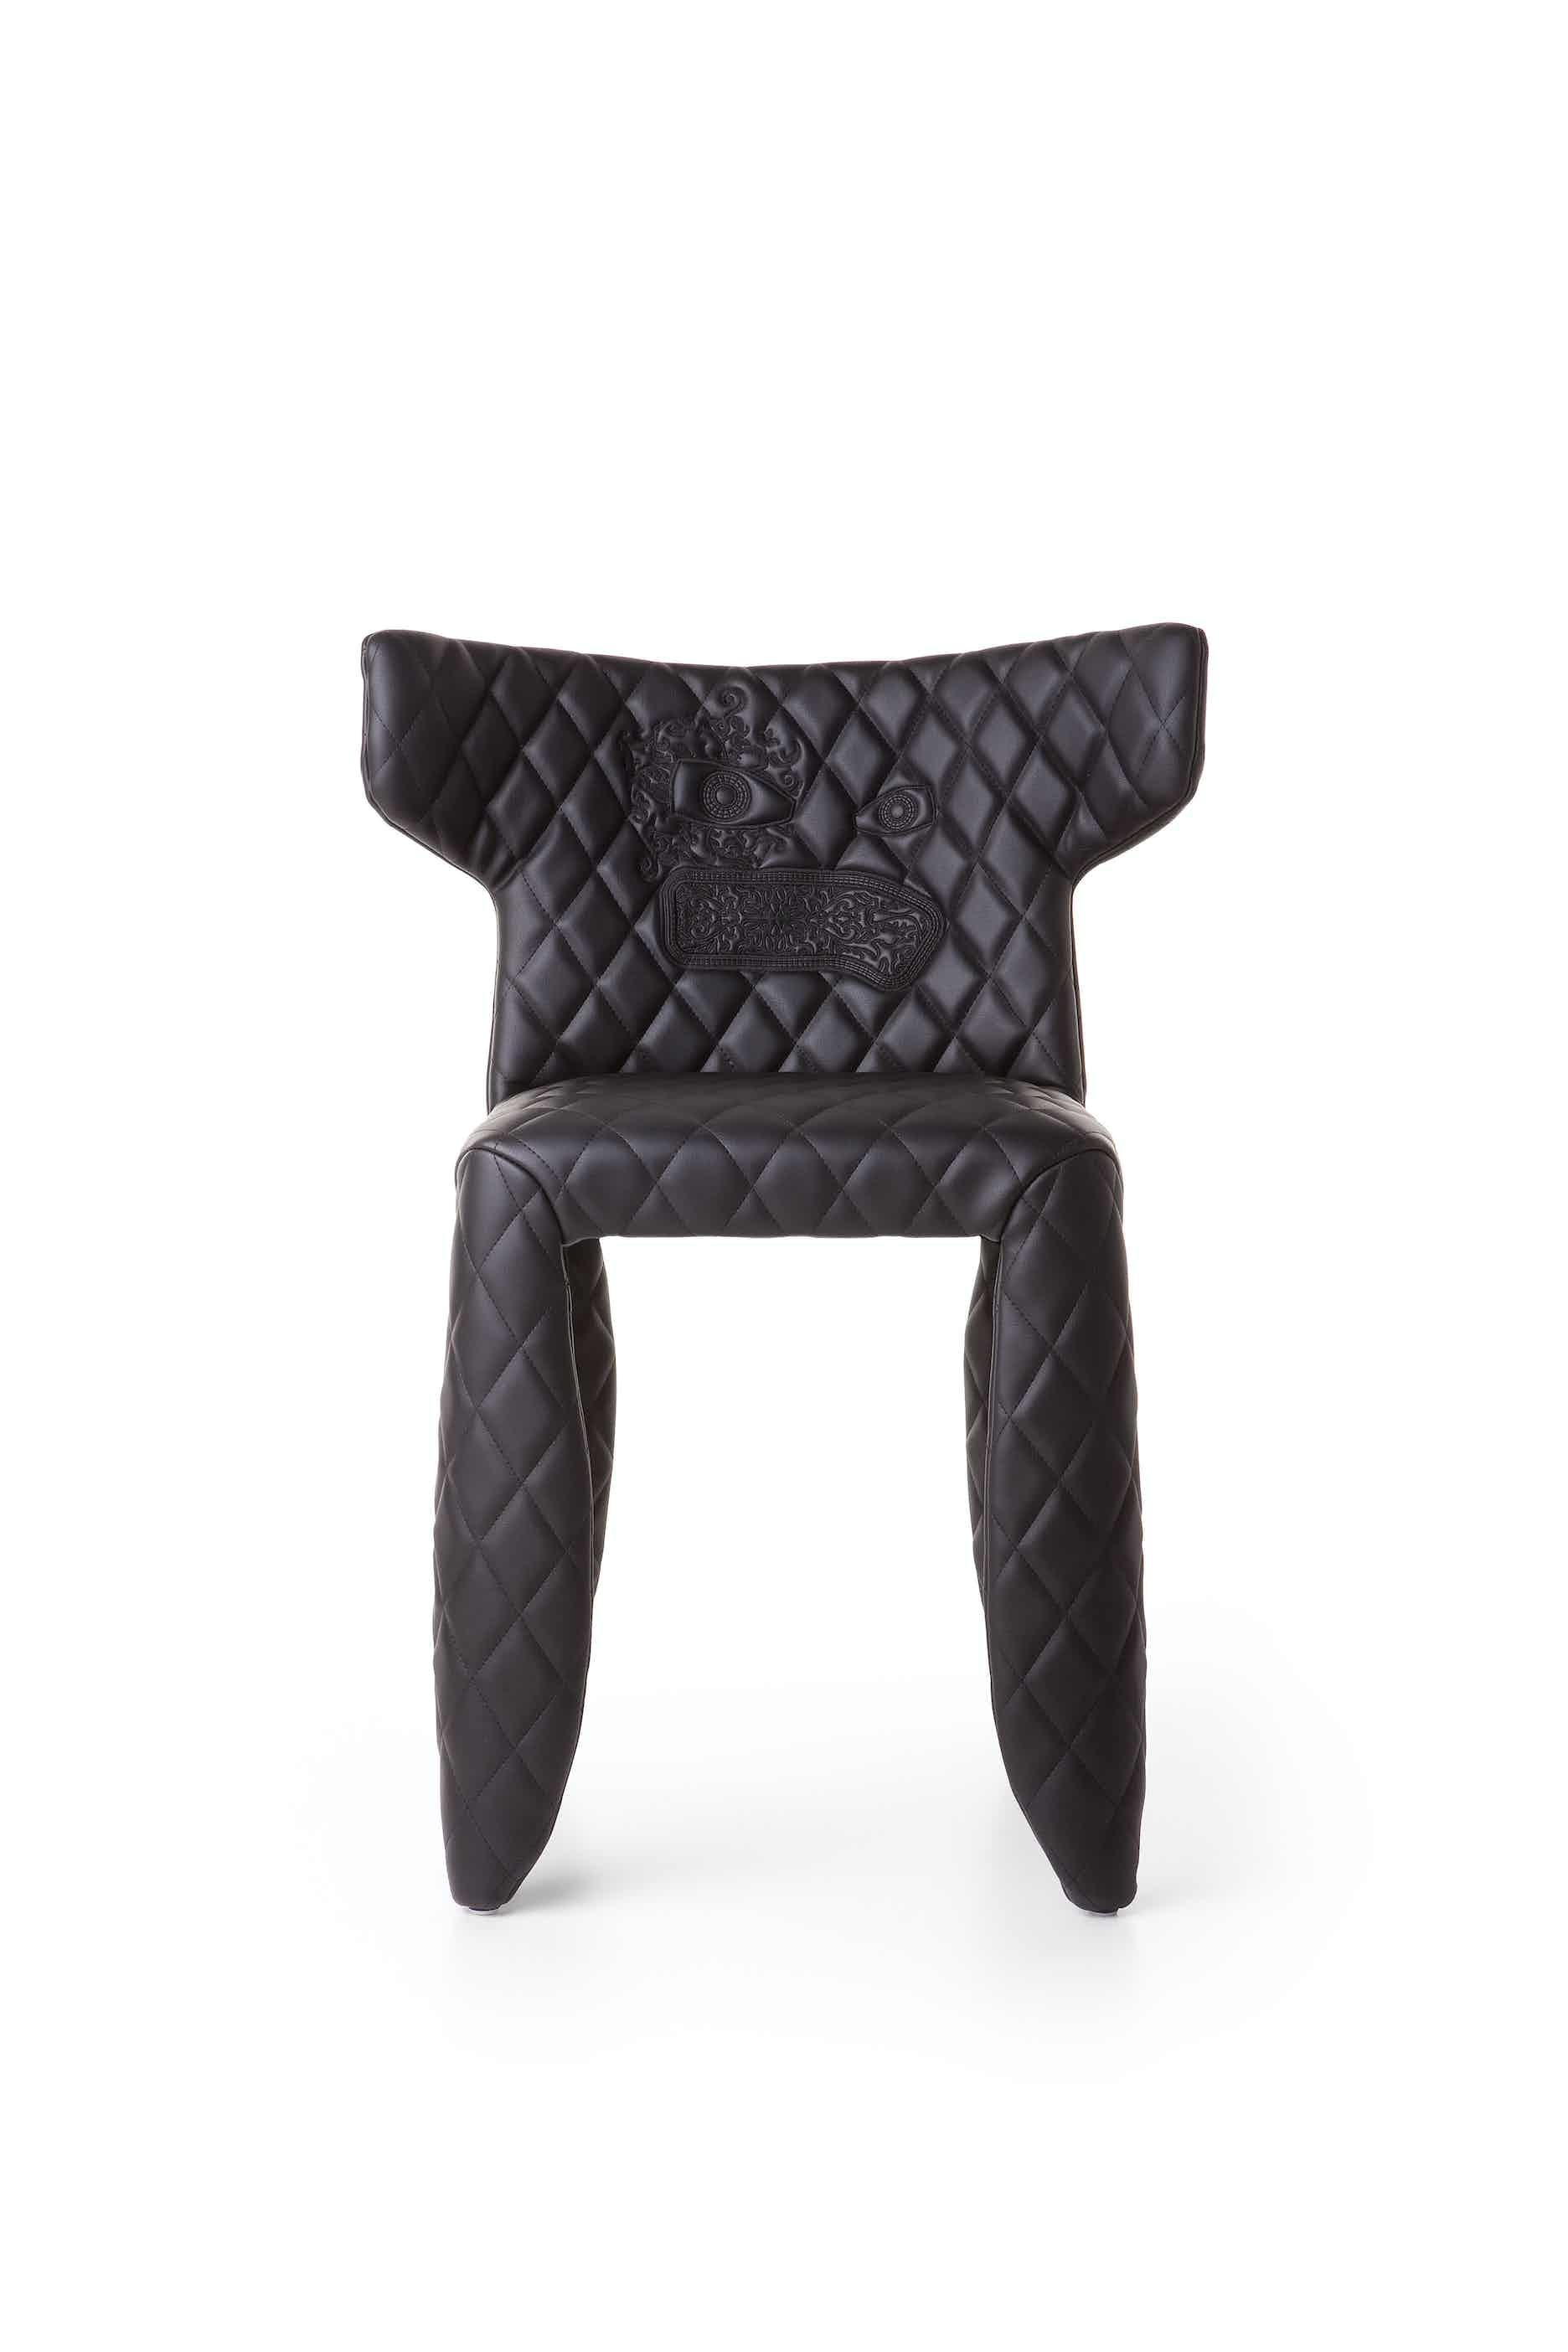 Monster Chair 2